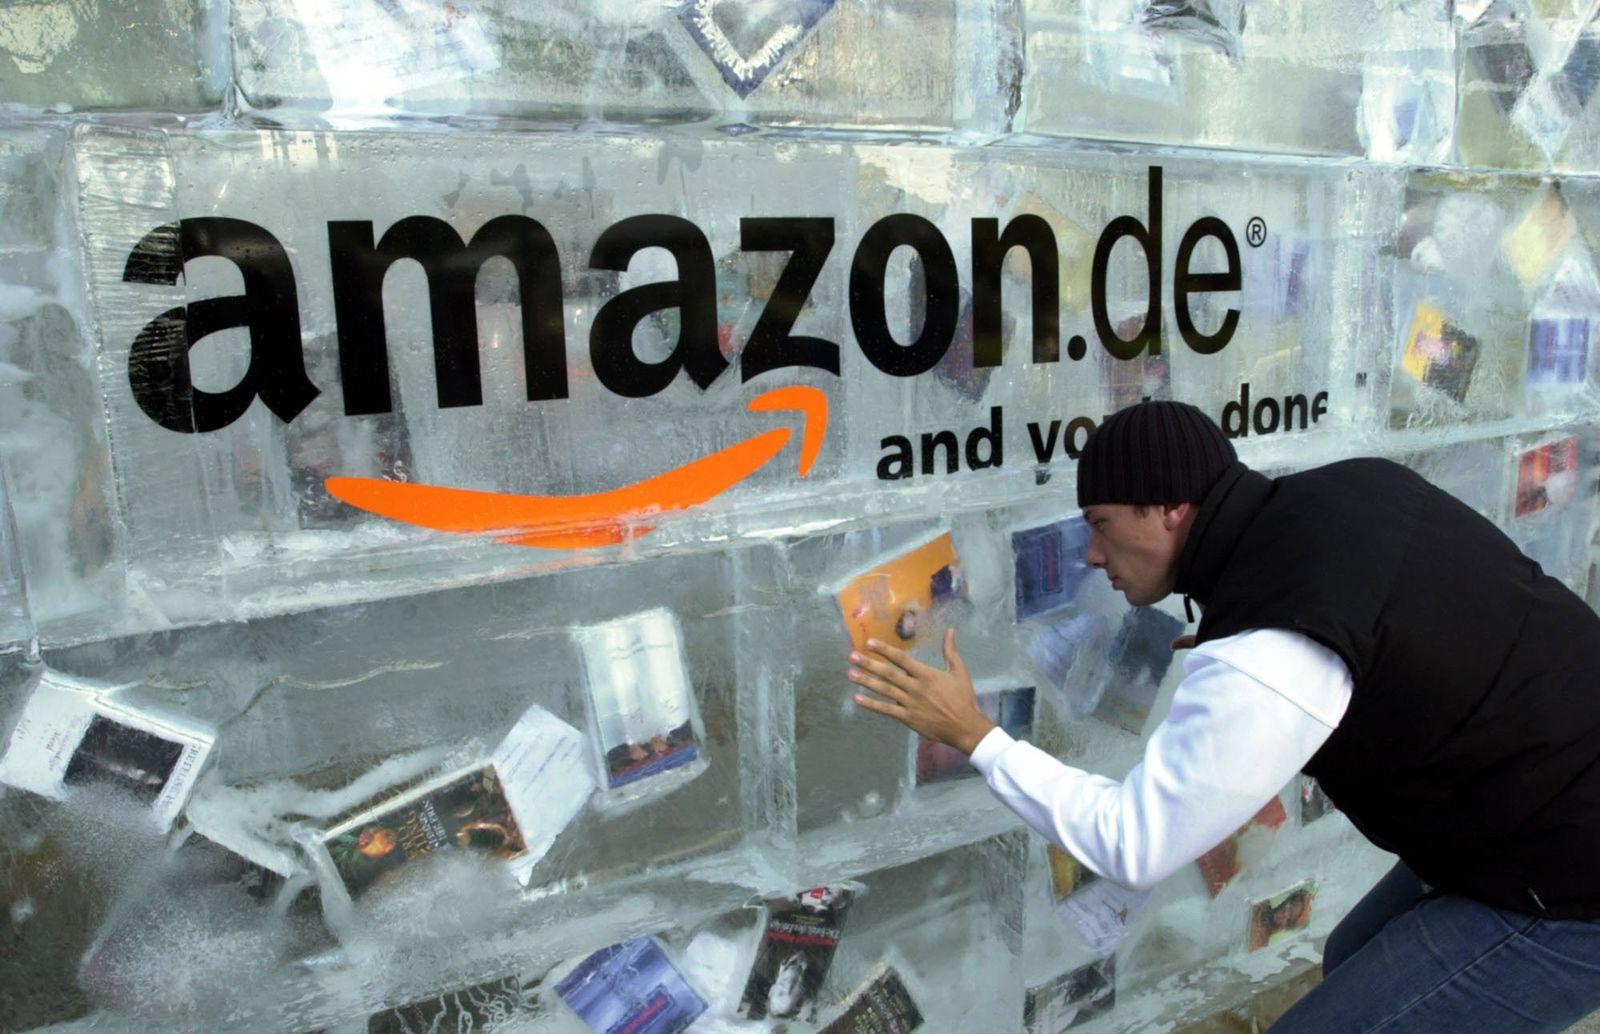 Amazon.de / Frankfurter Buchmesse / Eis